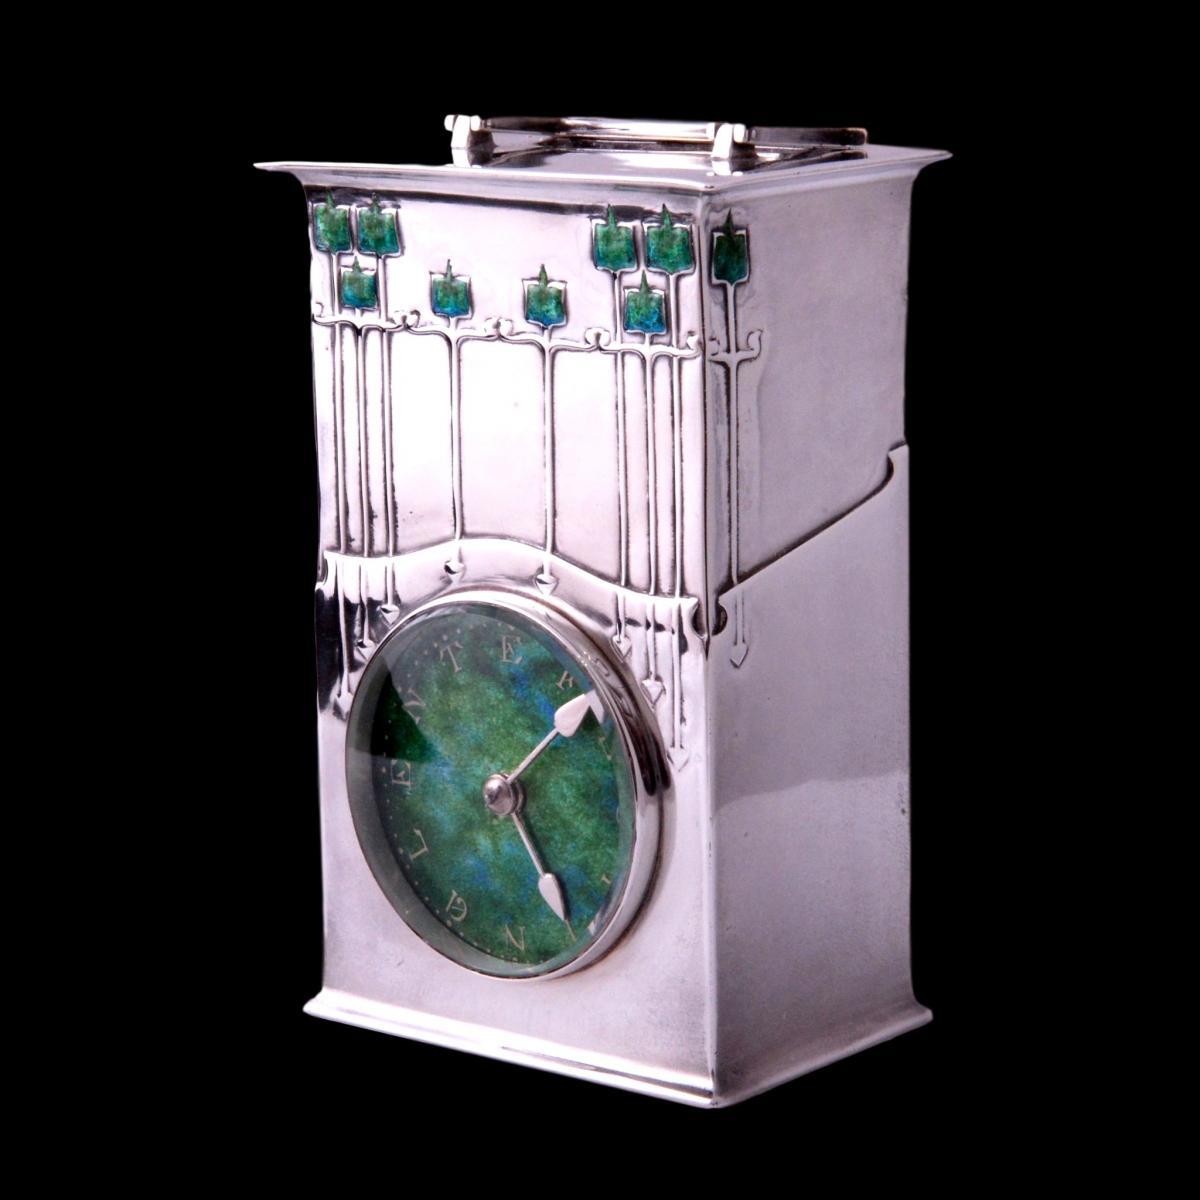 Archibald Knox Magnus Liberty Cymric clock